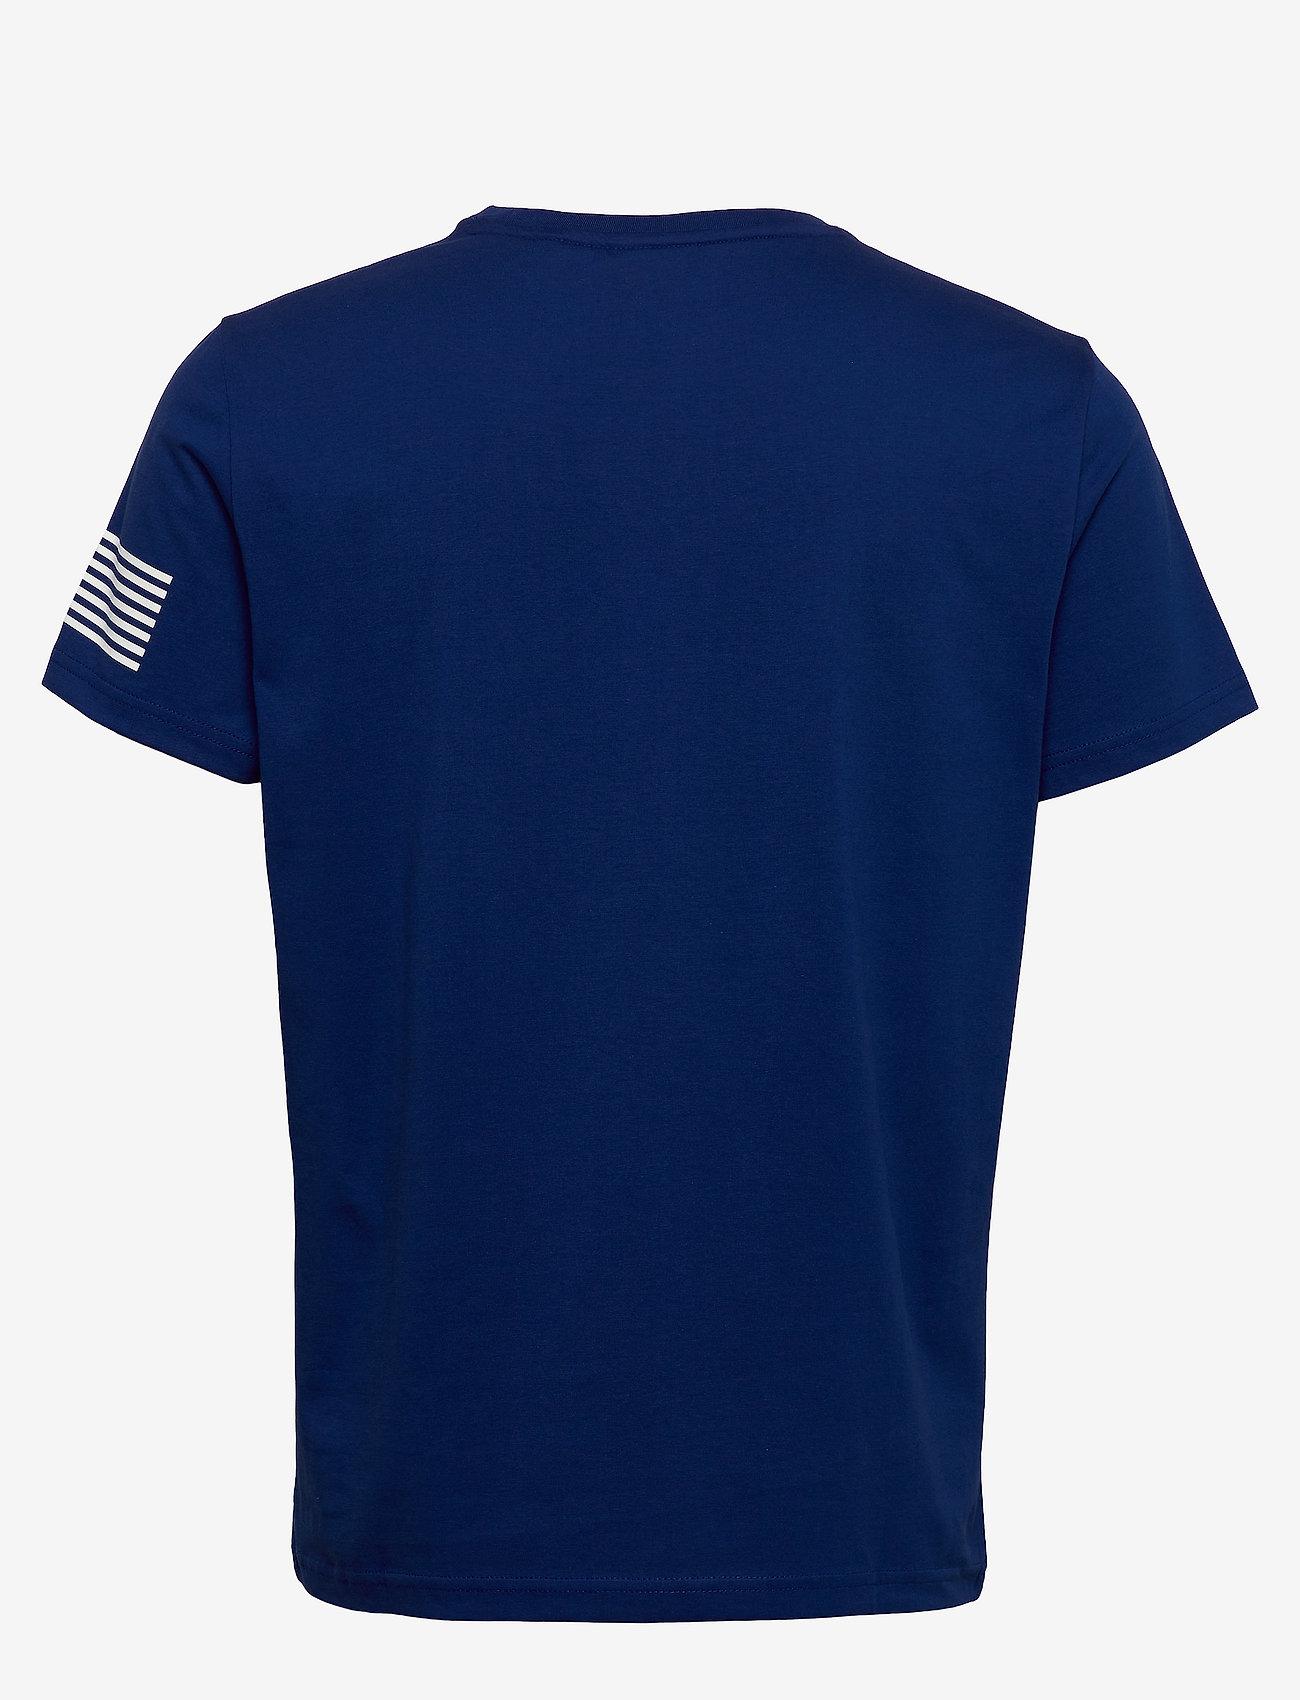 GANT - D1. 13 STRIPES SS T-SHIRT - short-sleeved t-shirts - crisp blue - 1